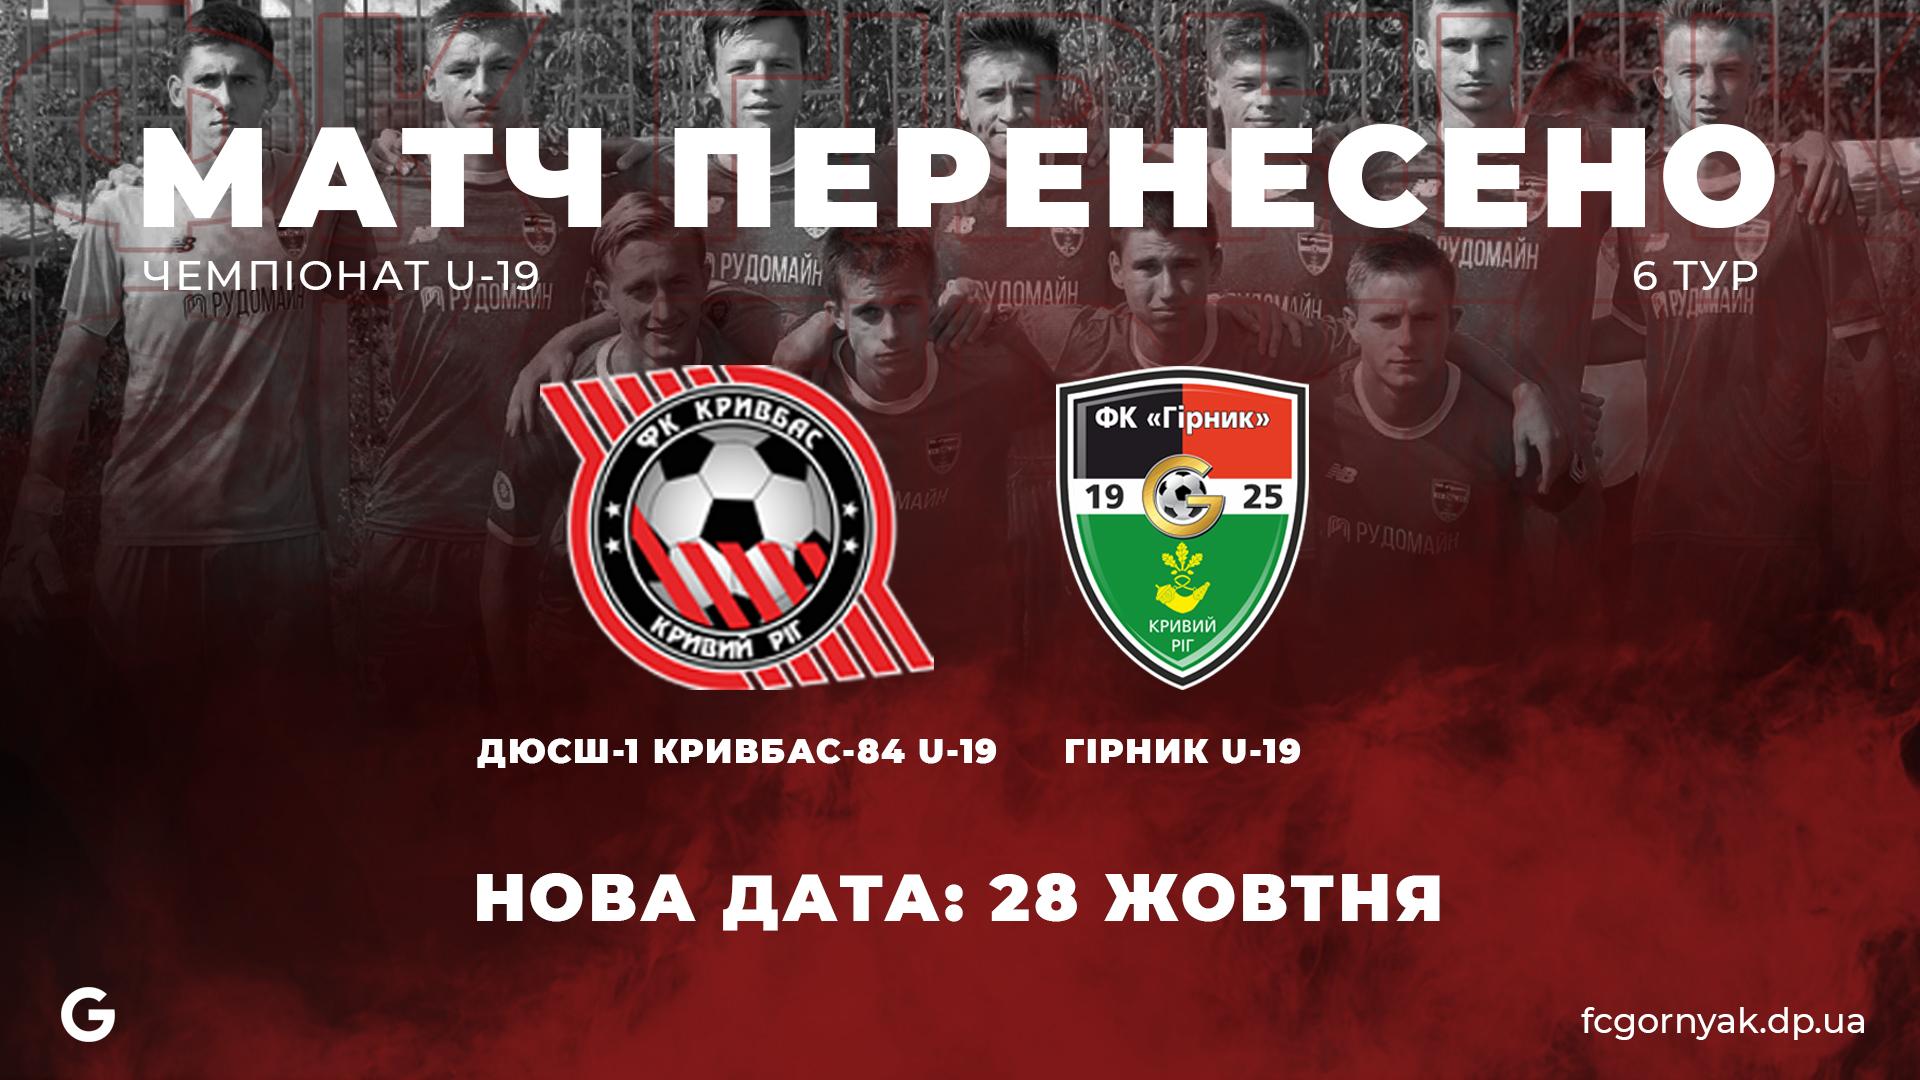 "ДЮСШ-1 ""Кривбасс-84"" U-19 - ""Горняк"" U-19: матч перенесен"